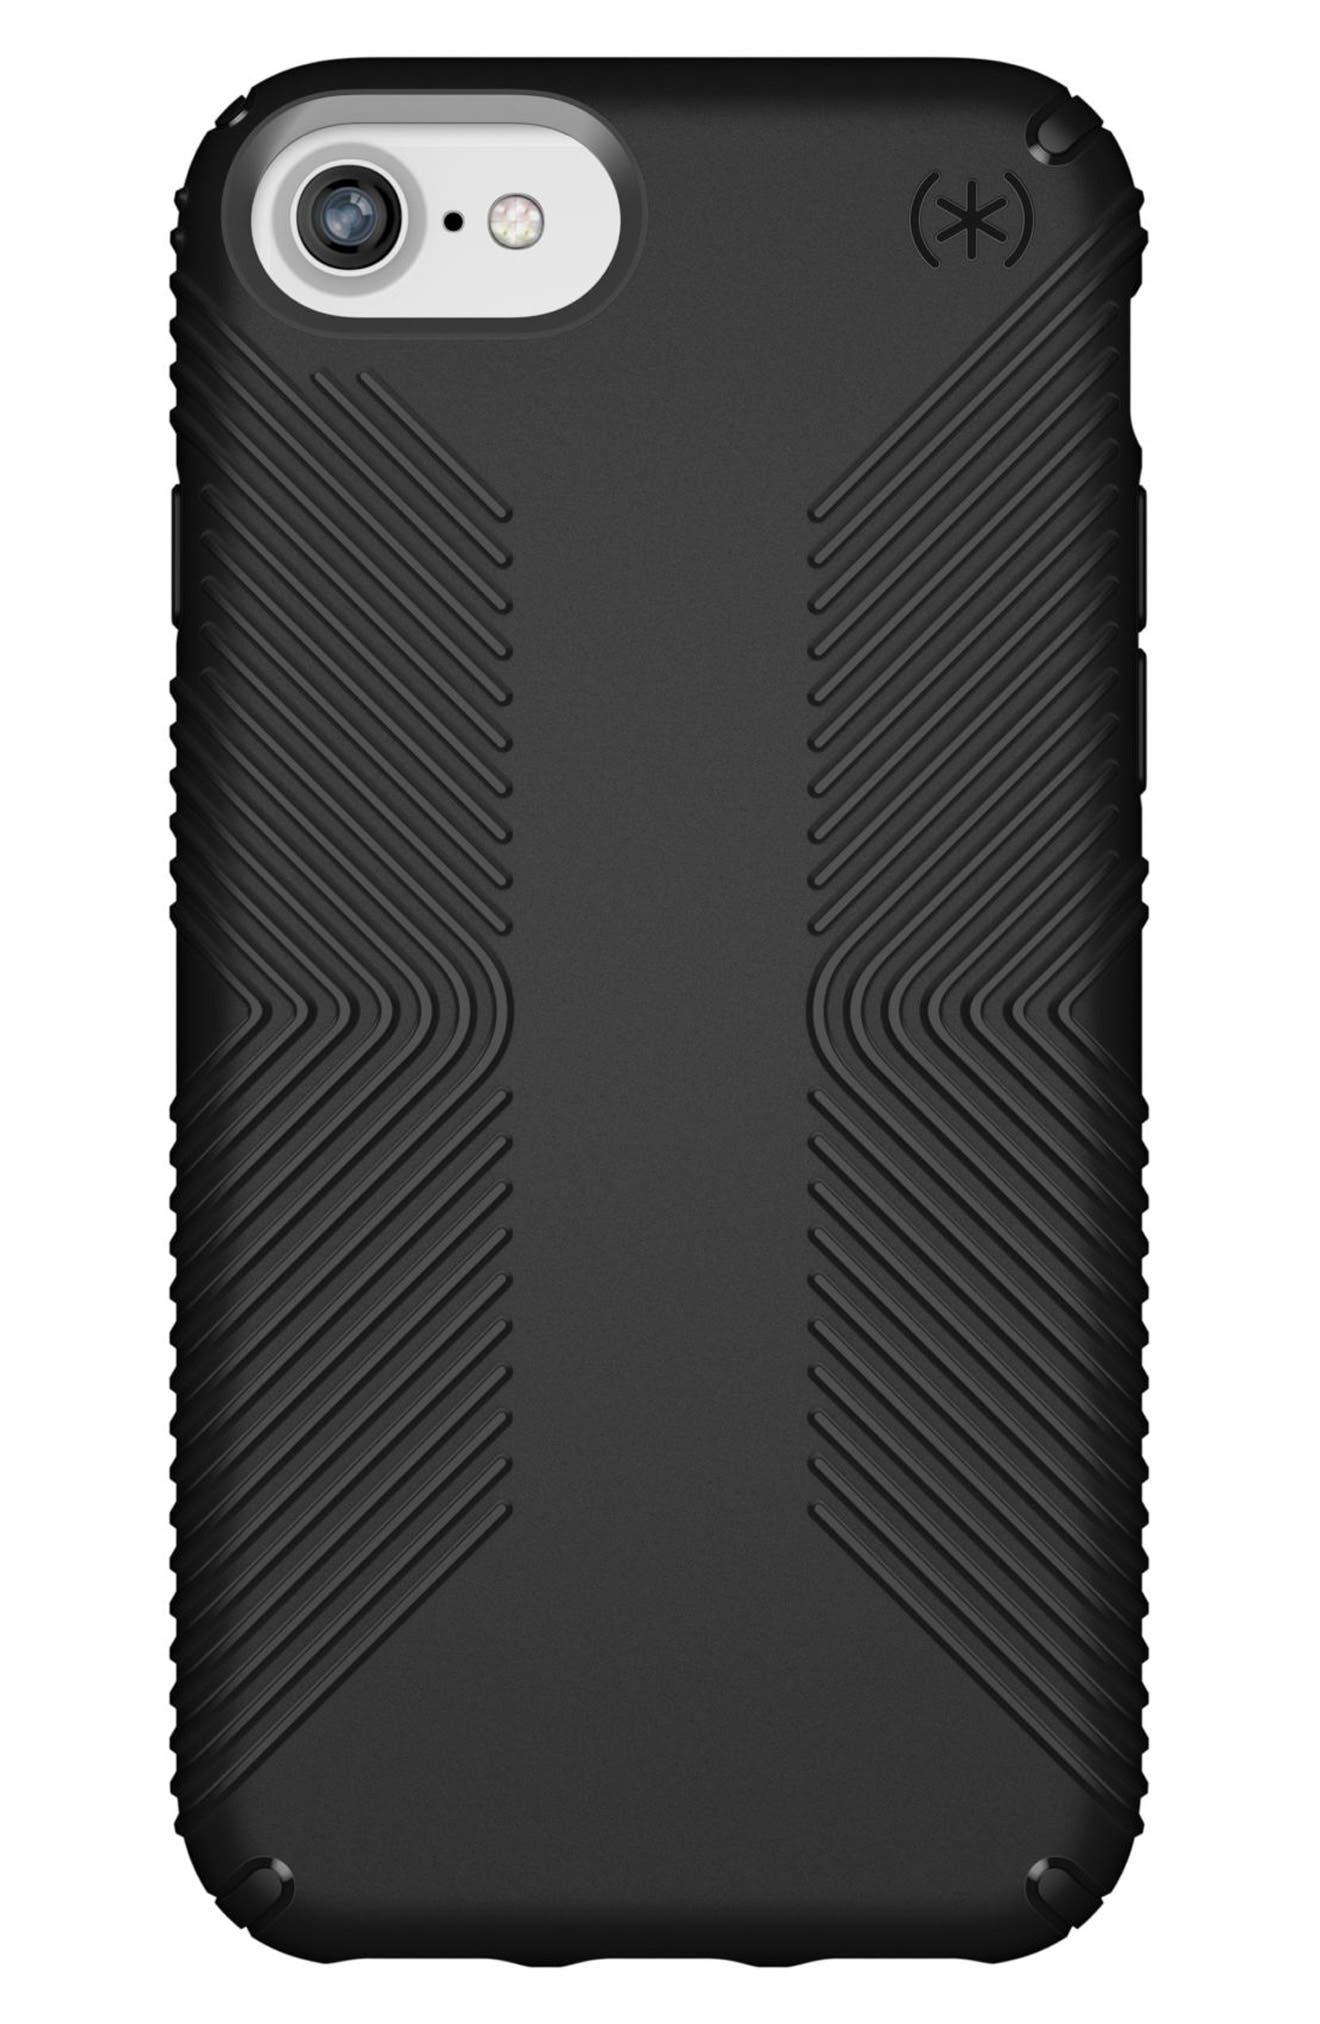 Grip iPhone 6/6s/7/8 Case,                         Main,                         color, 001